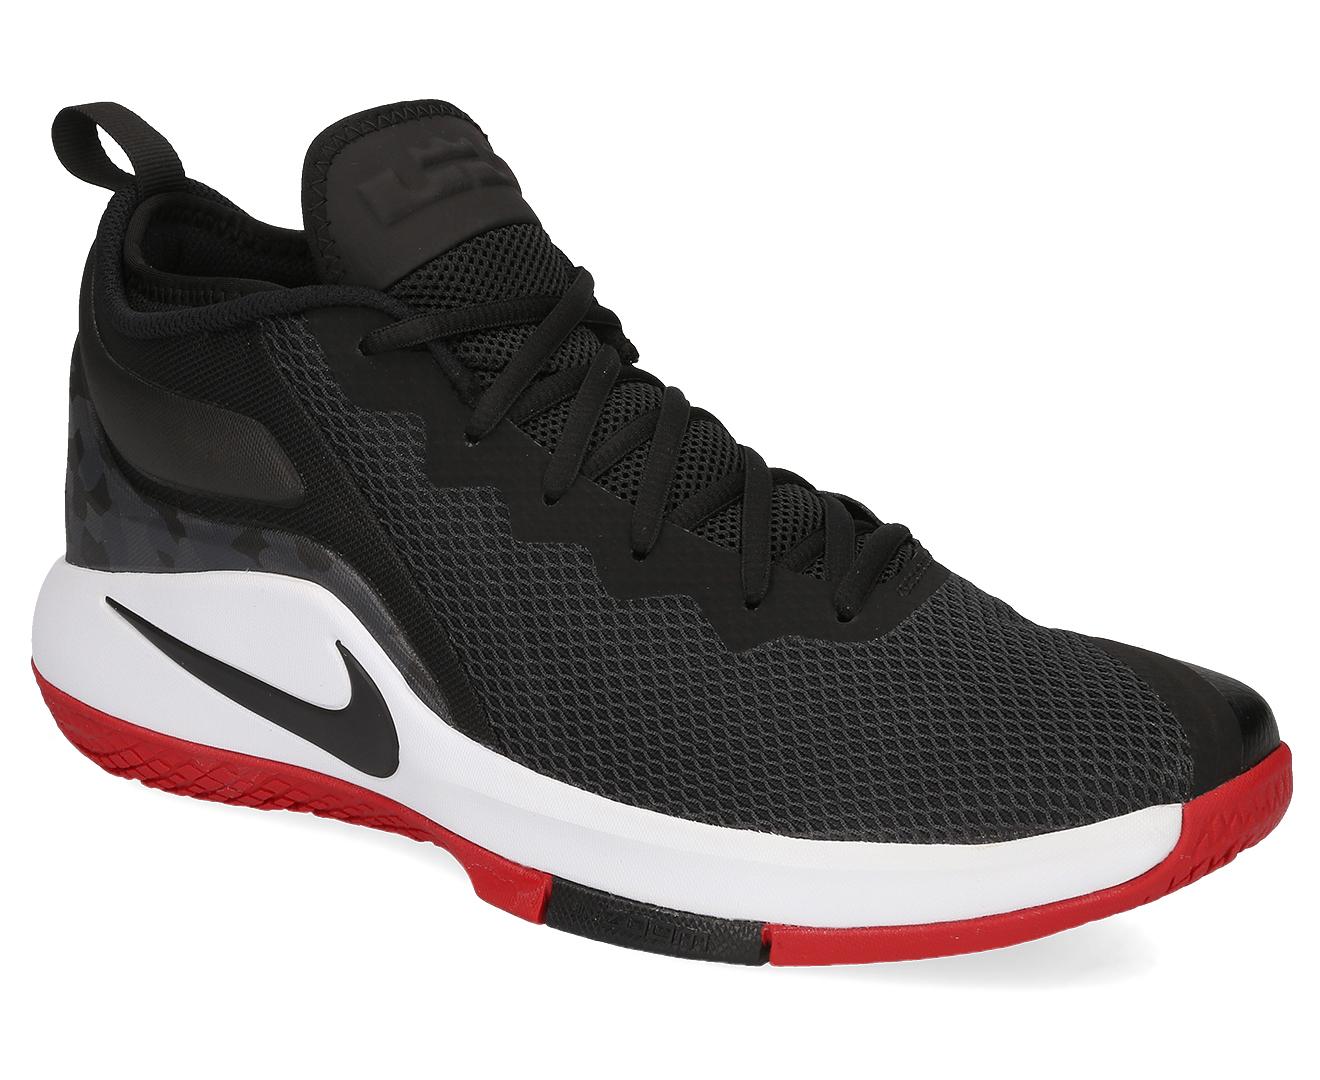 adbca8d114db Nike Men s Lebron Witness II Shoe - Black White Gym Red